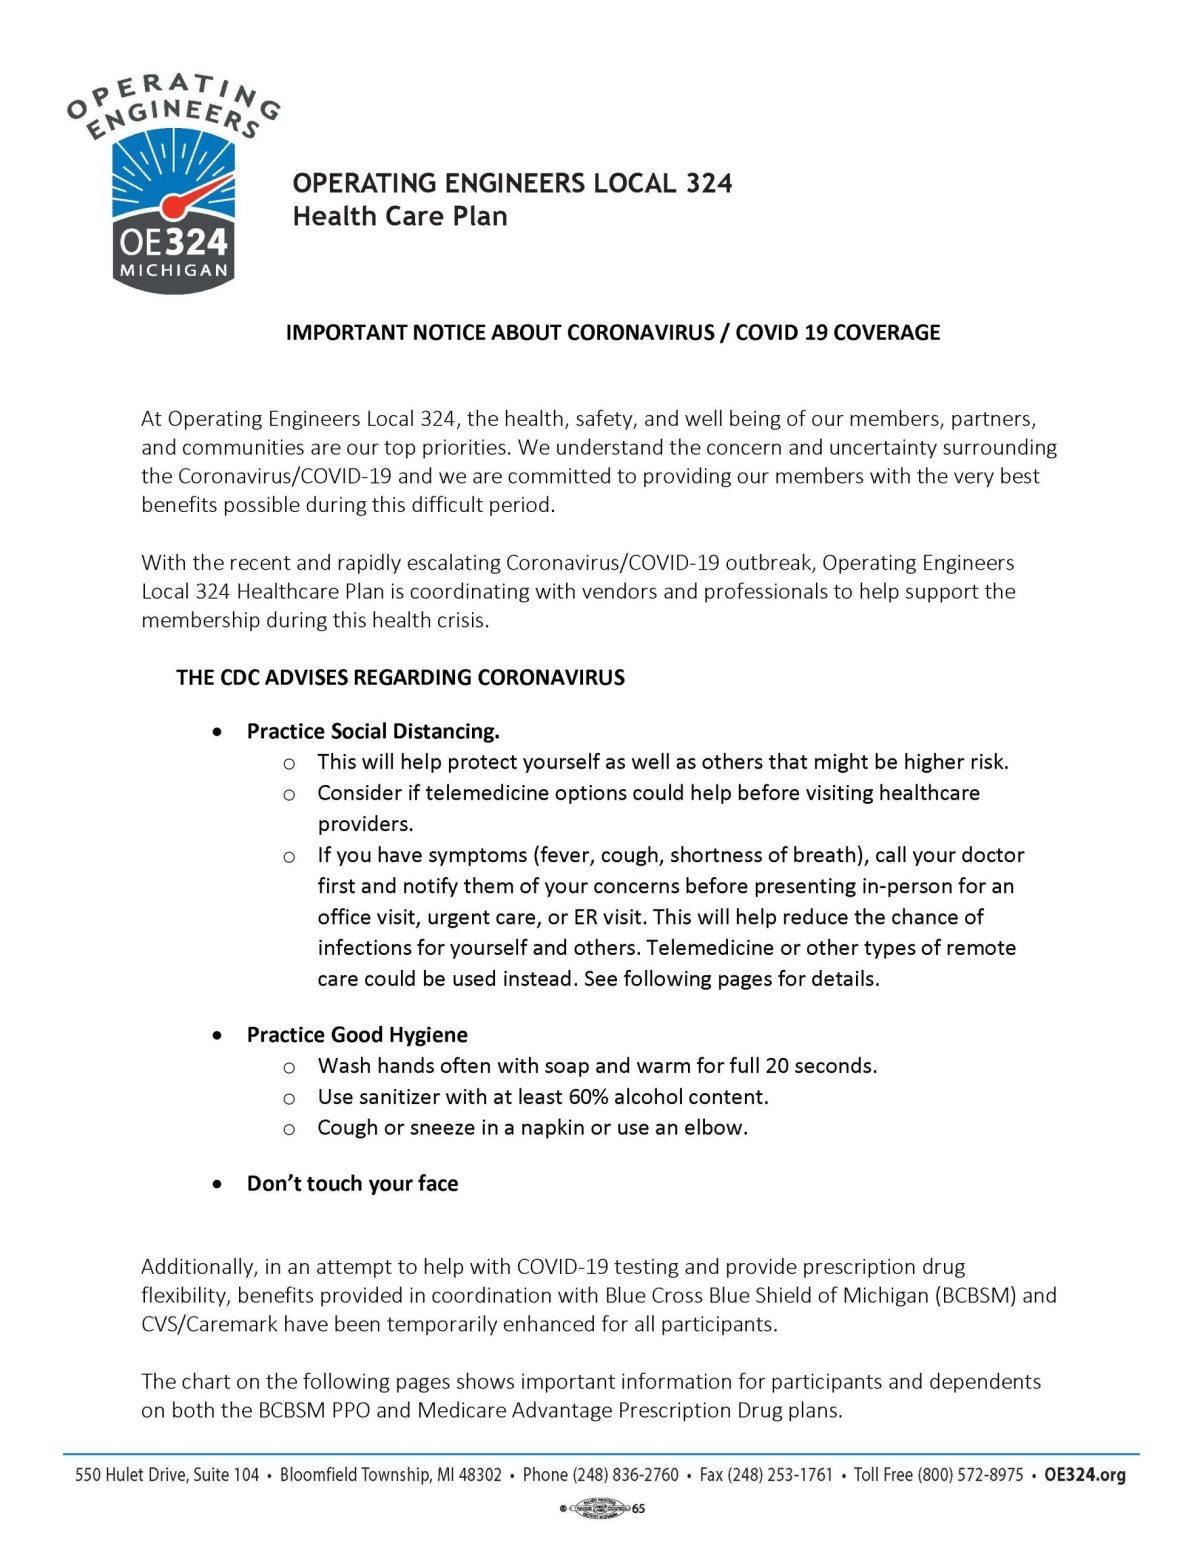 OE 324 | Operating Engineers 324 Health Care Plan ...